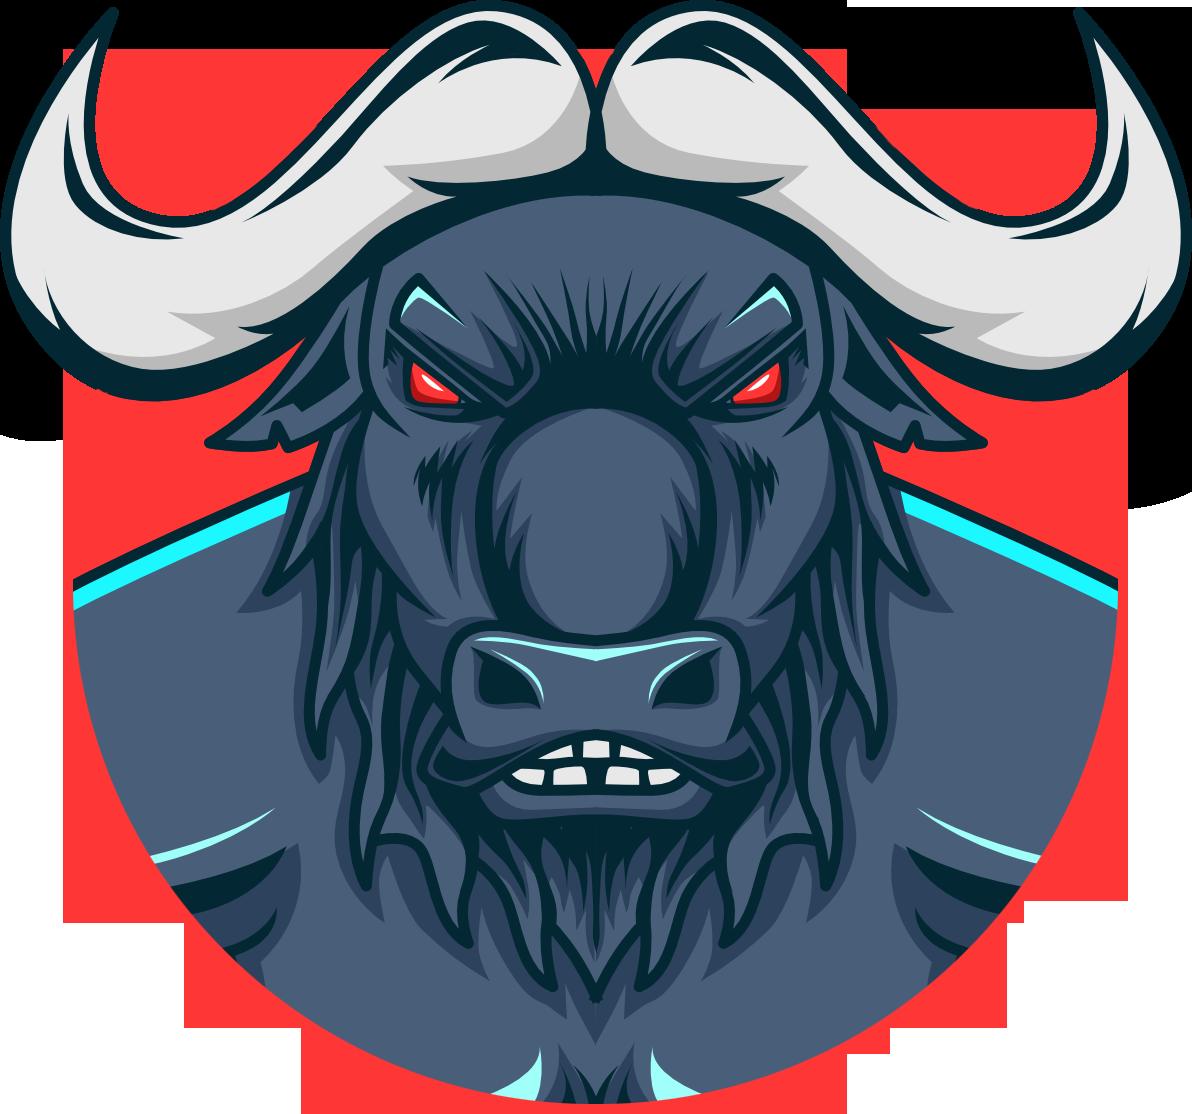 https://solidproof.io/storage/logos/G2qVP943CsBWyDfb5efrdM6L0ZRyYVvFik2KeOBM.png